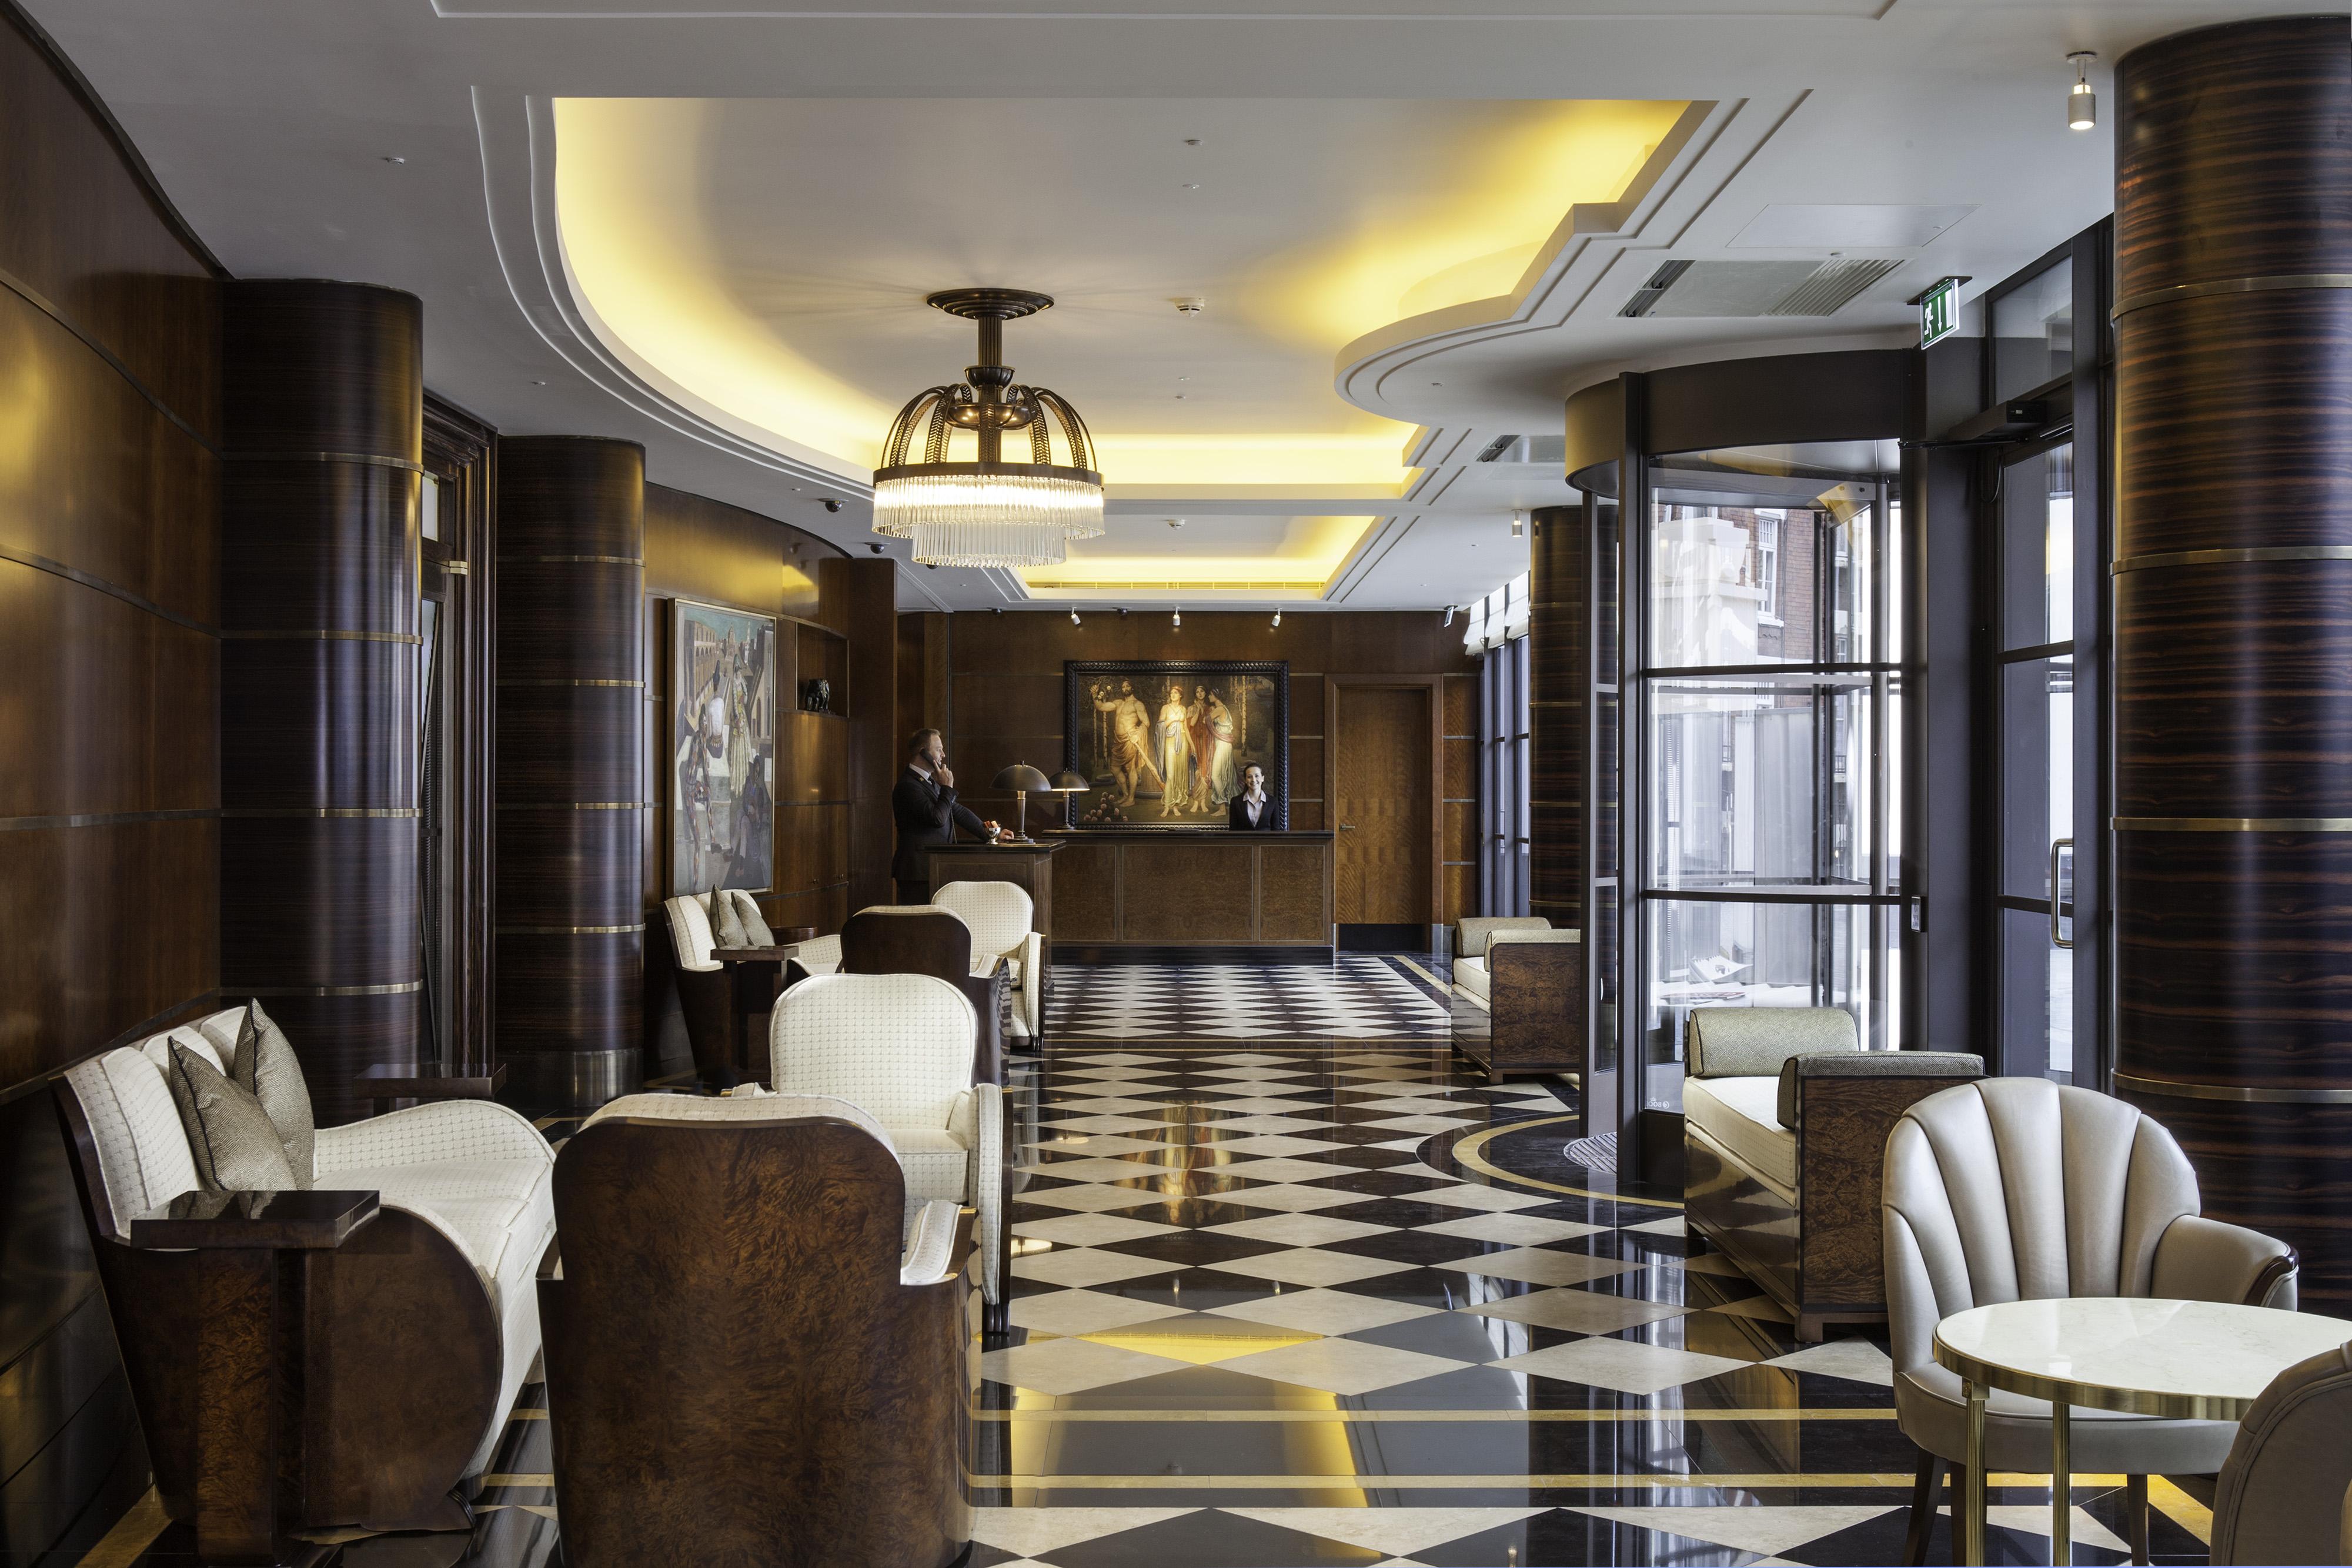 7586-the-beaumont-lobby.jpg